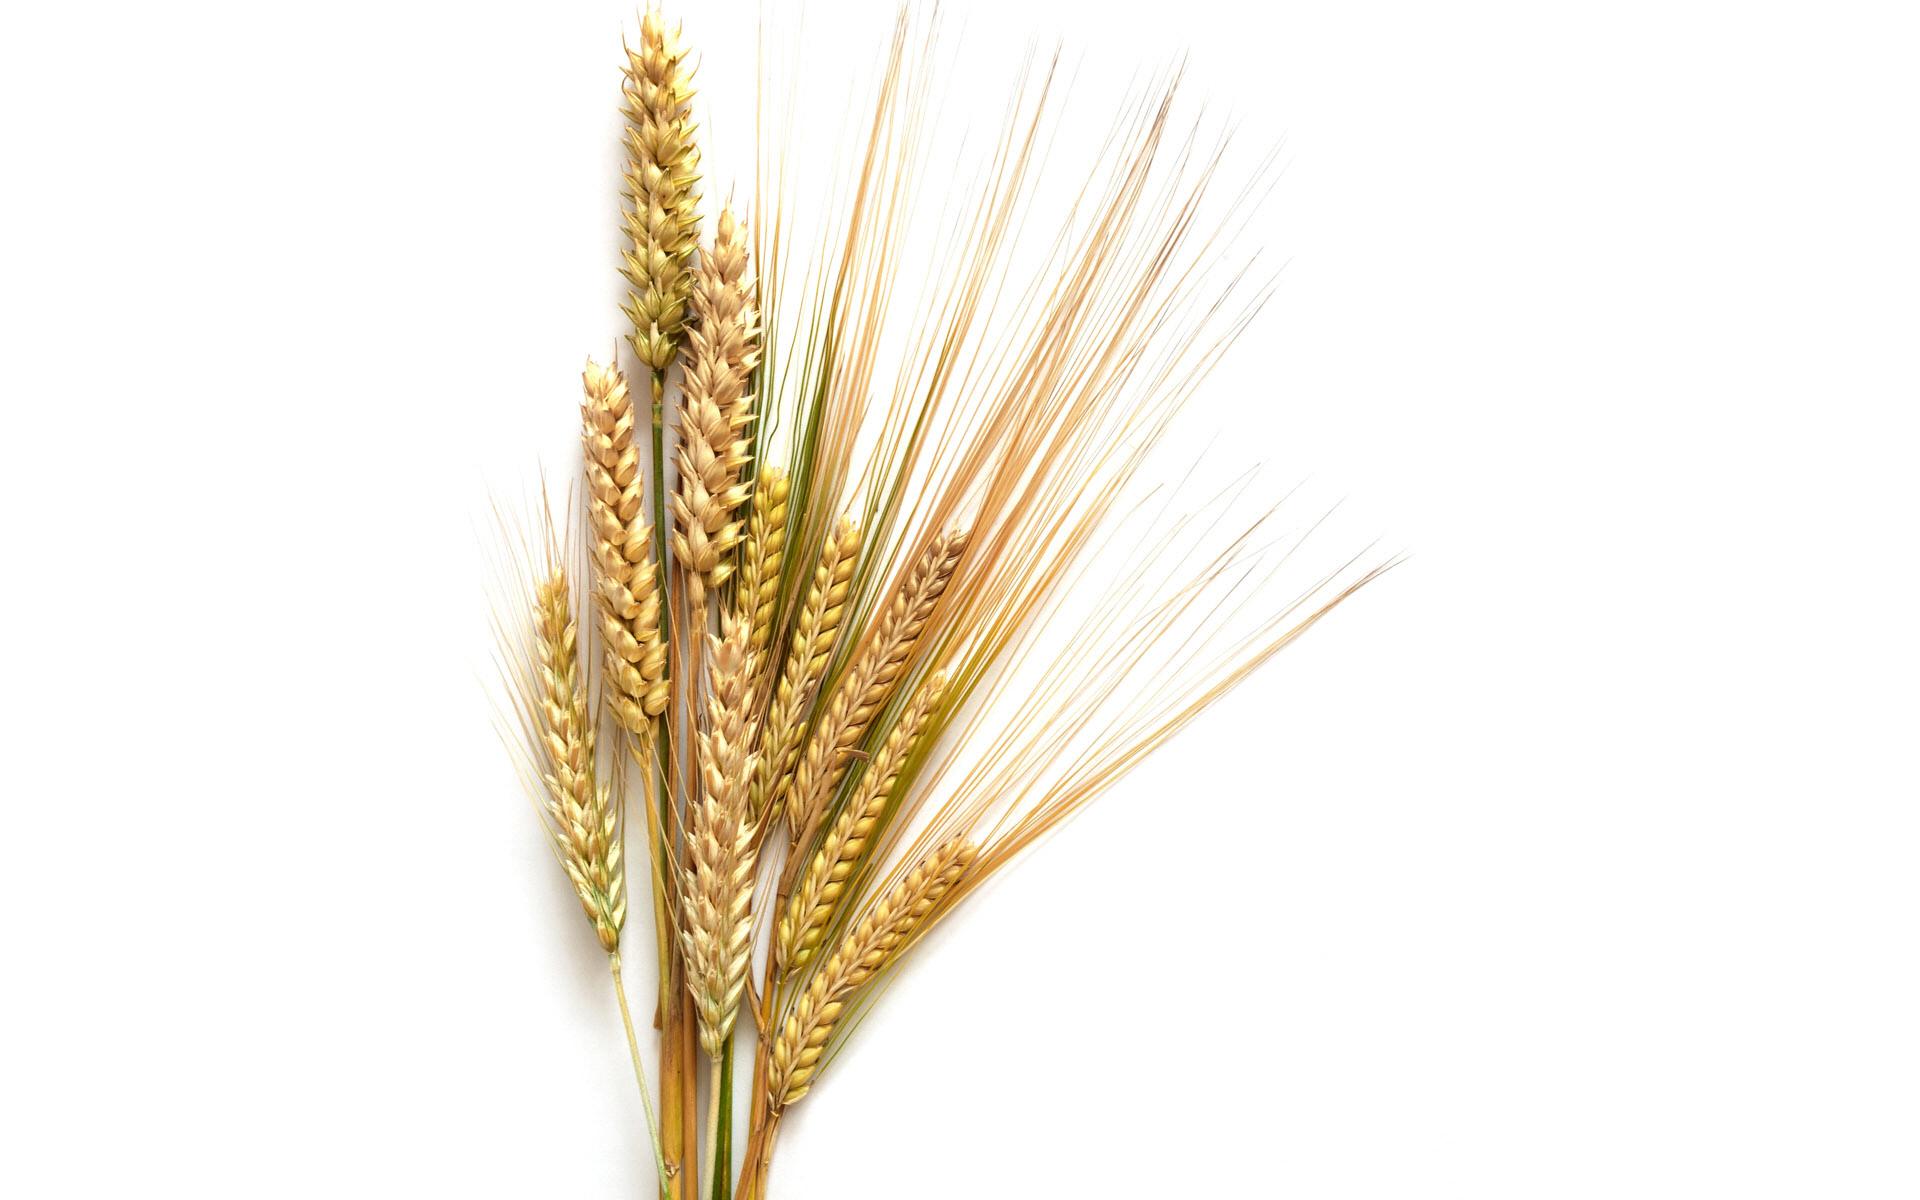 Free head cliparts download. Wheat clipart border